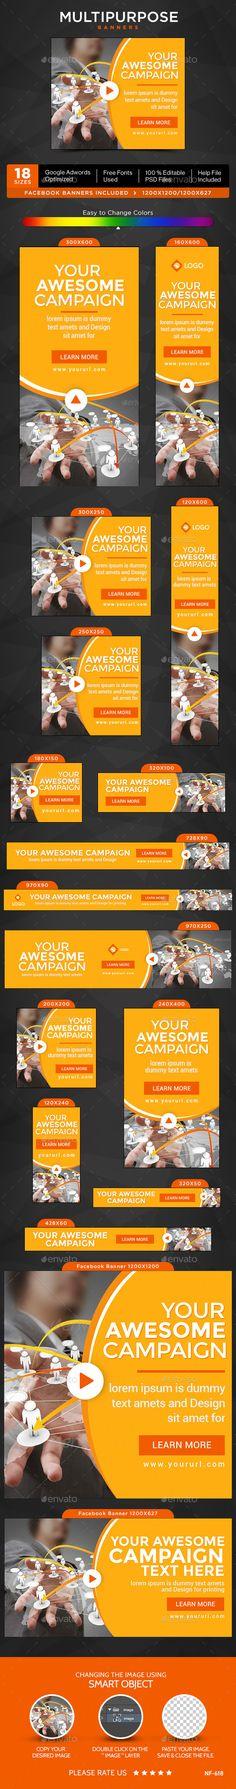 Multipurpose Banners Template #bannerdesign #webbanners Download: http://graphicriver.net/item/multipurpose-banners/12800651?ref=ksioks